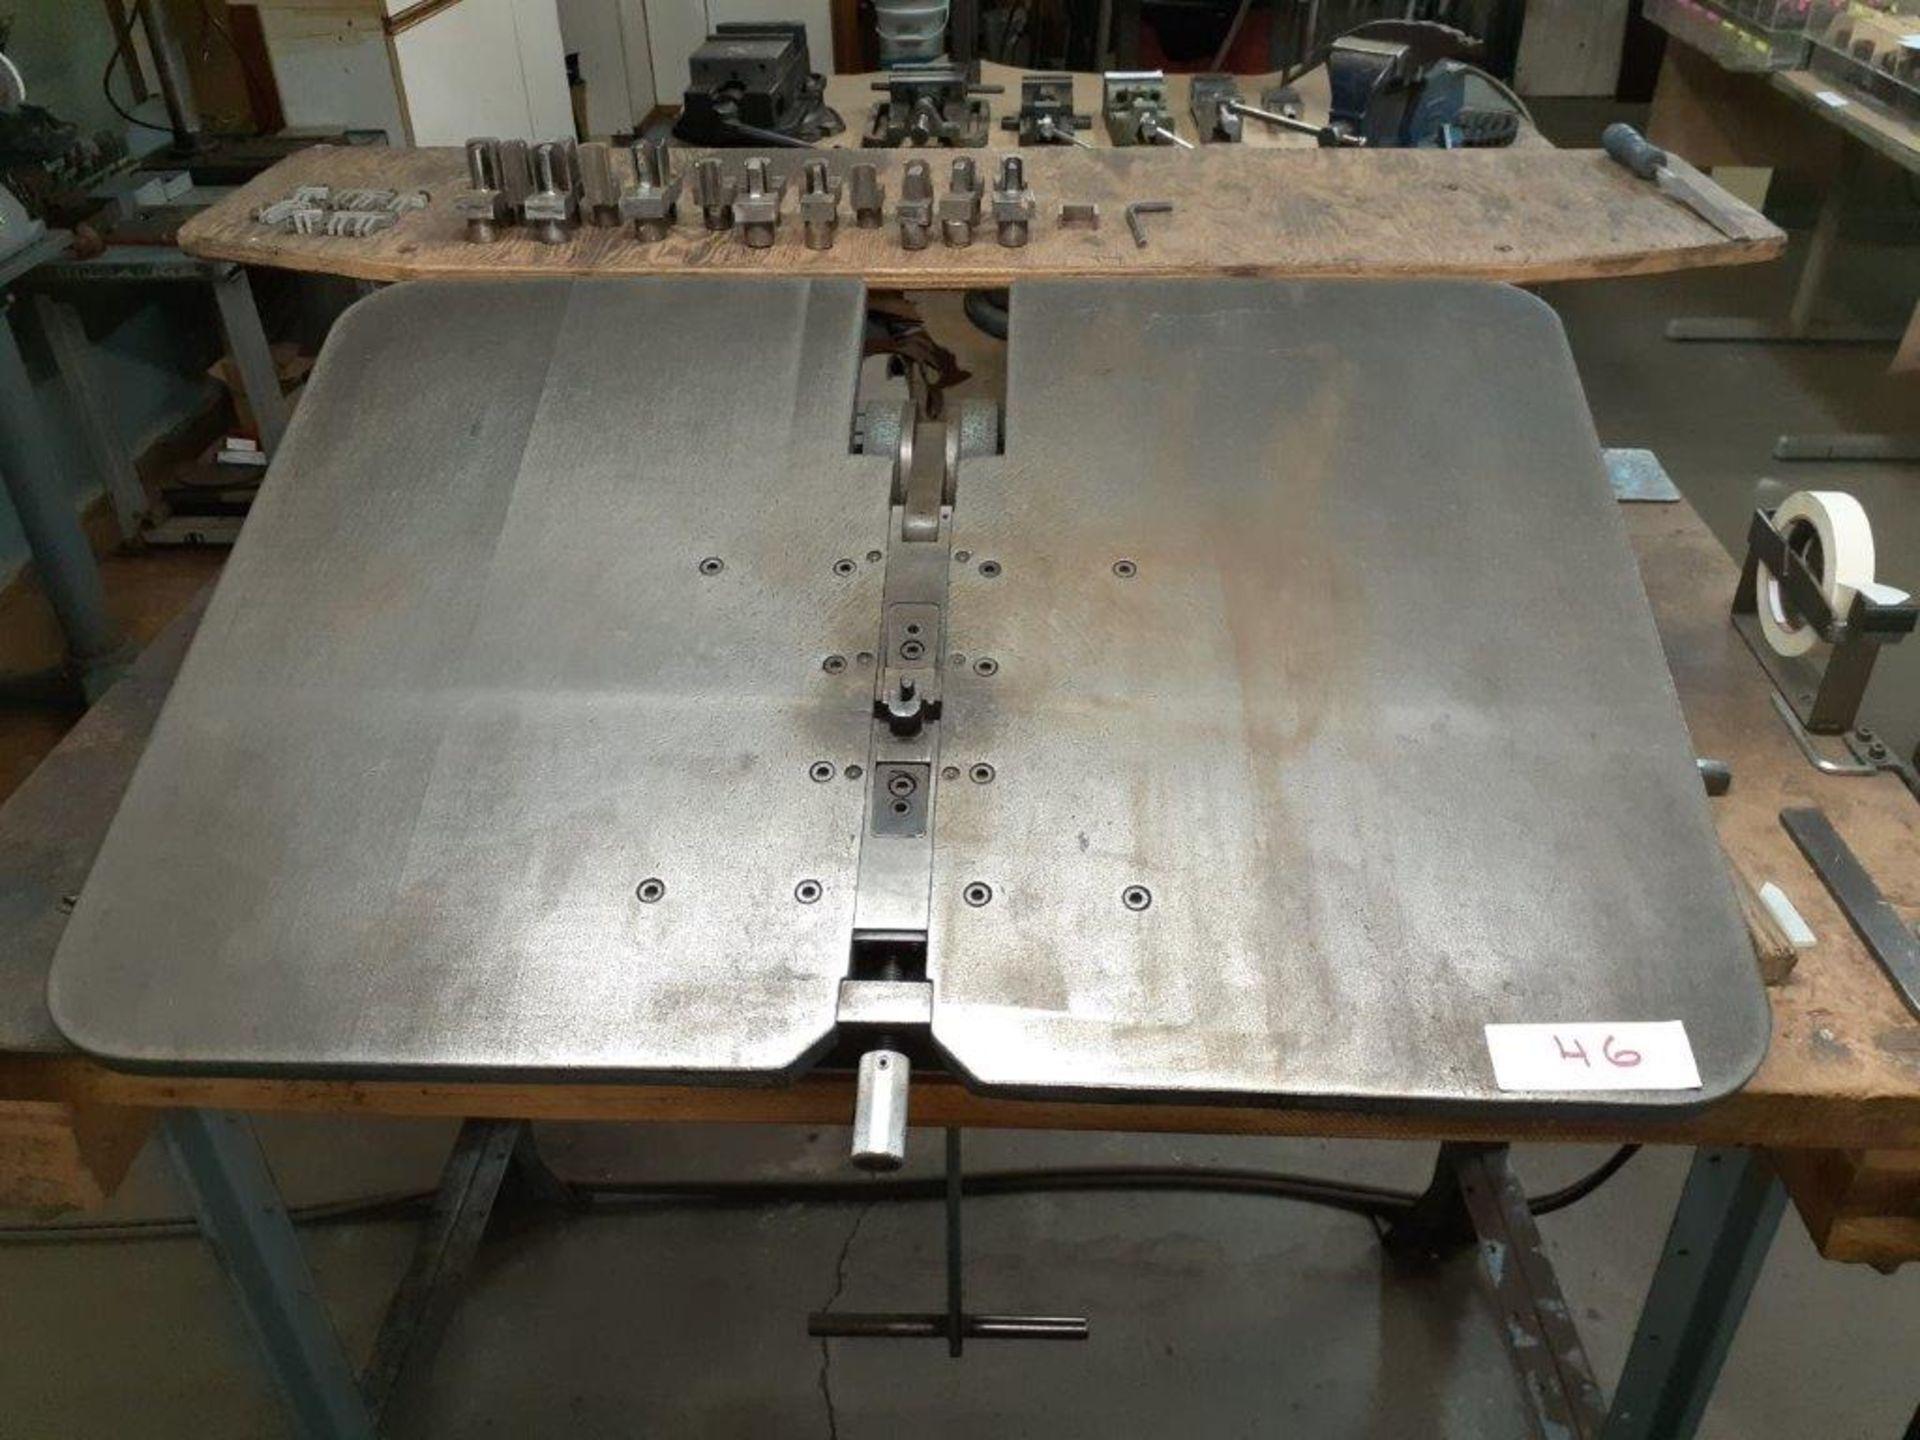 "SANDVIK Heavy Duty Kick Bender, c/w Table (24"" x 33.5"") & Tools - Image 3 of 4"